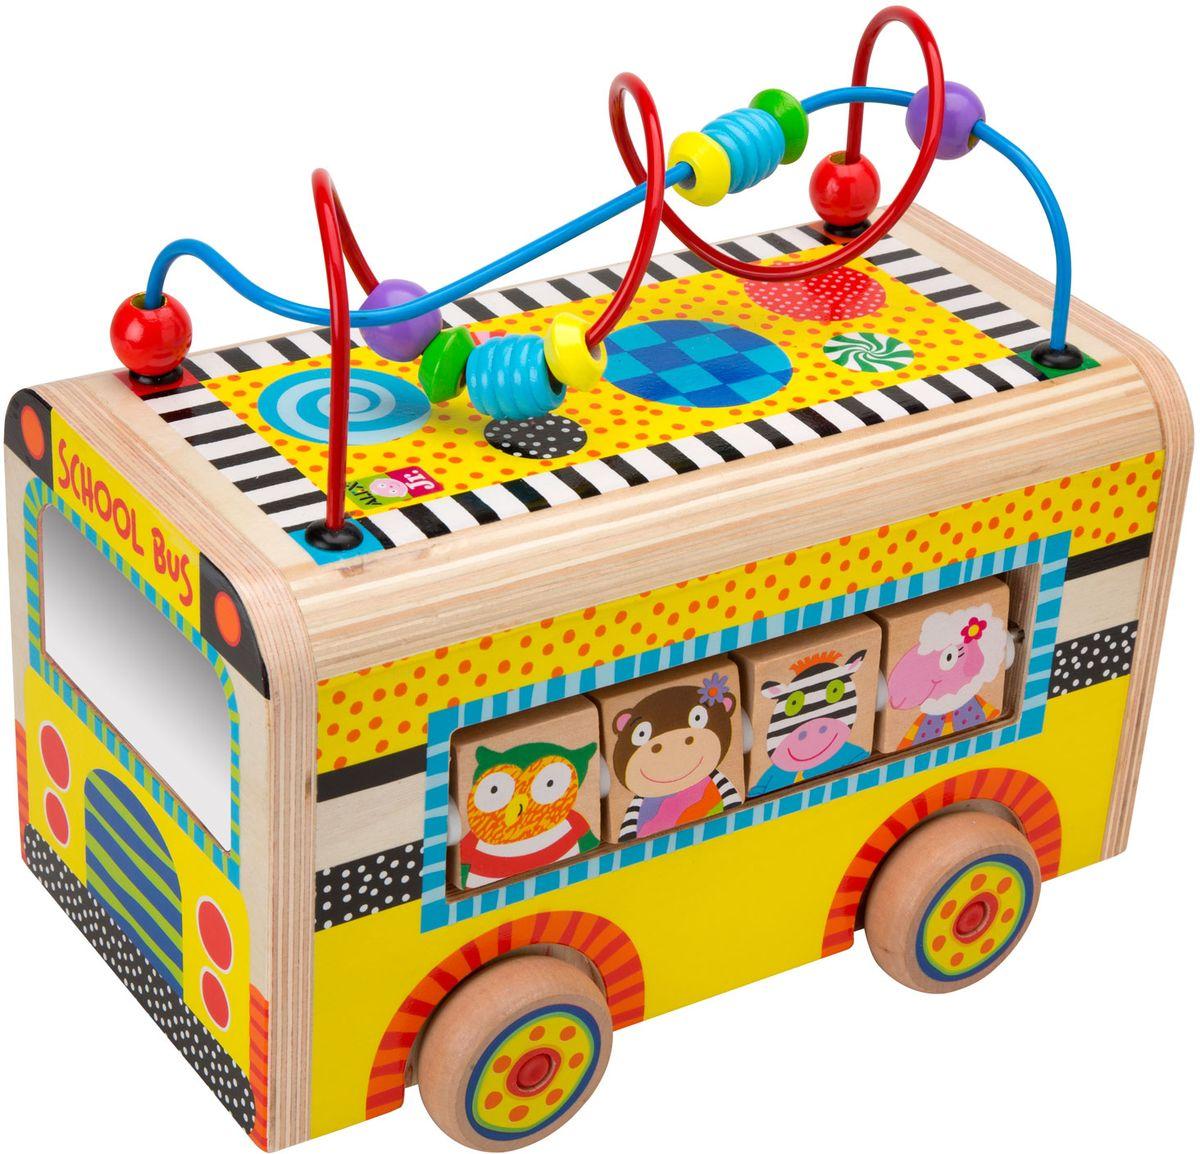 Alex Развивающий центр Веселый автобус 1997 bestway развивающий центр машина с шариками